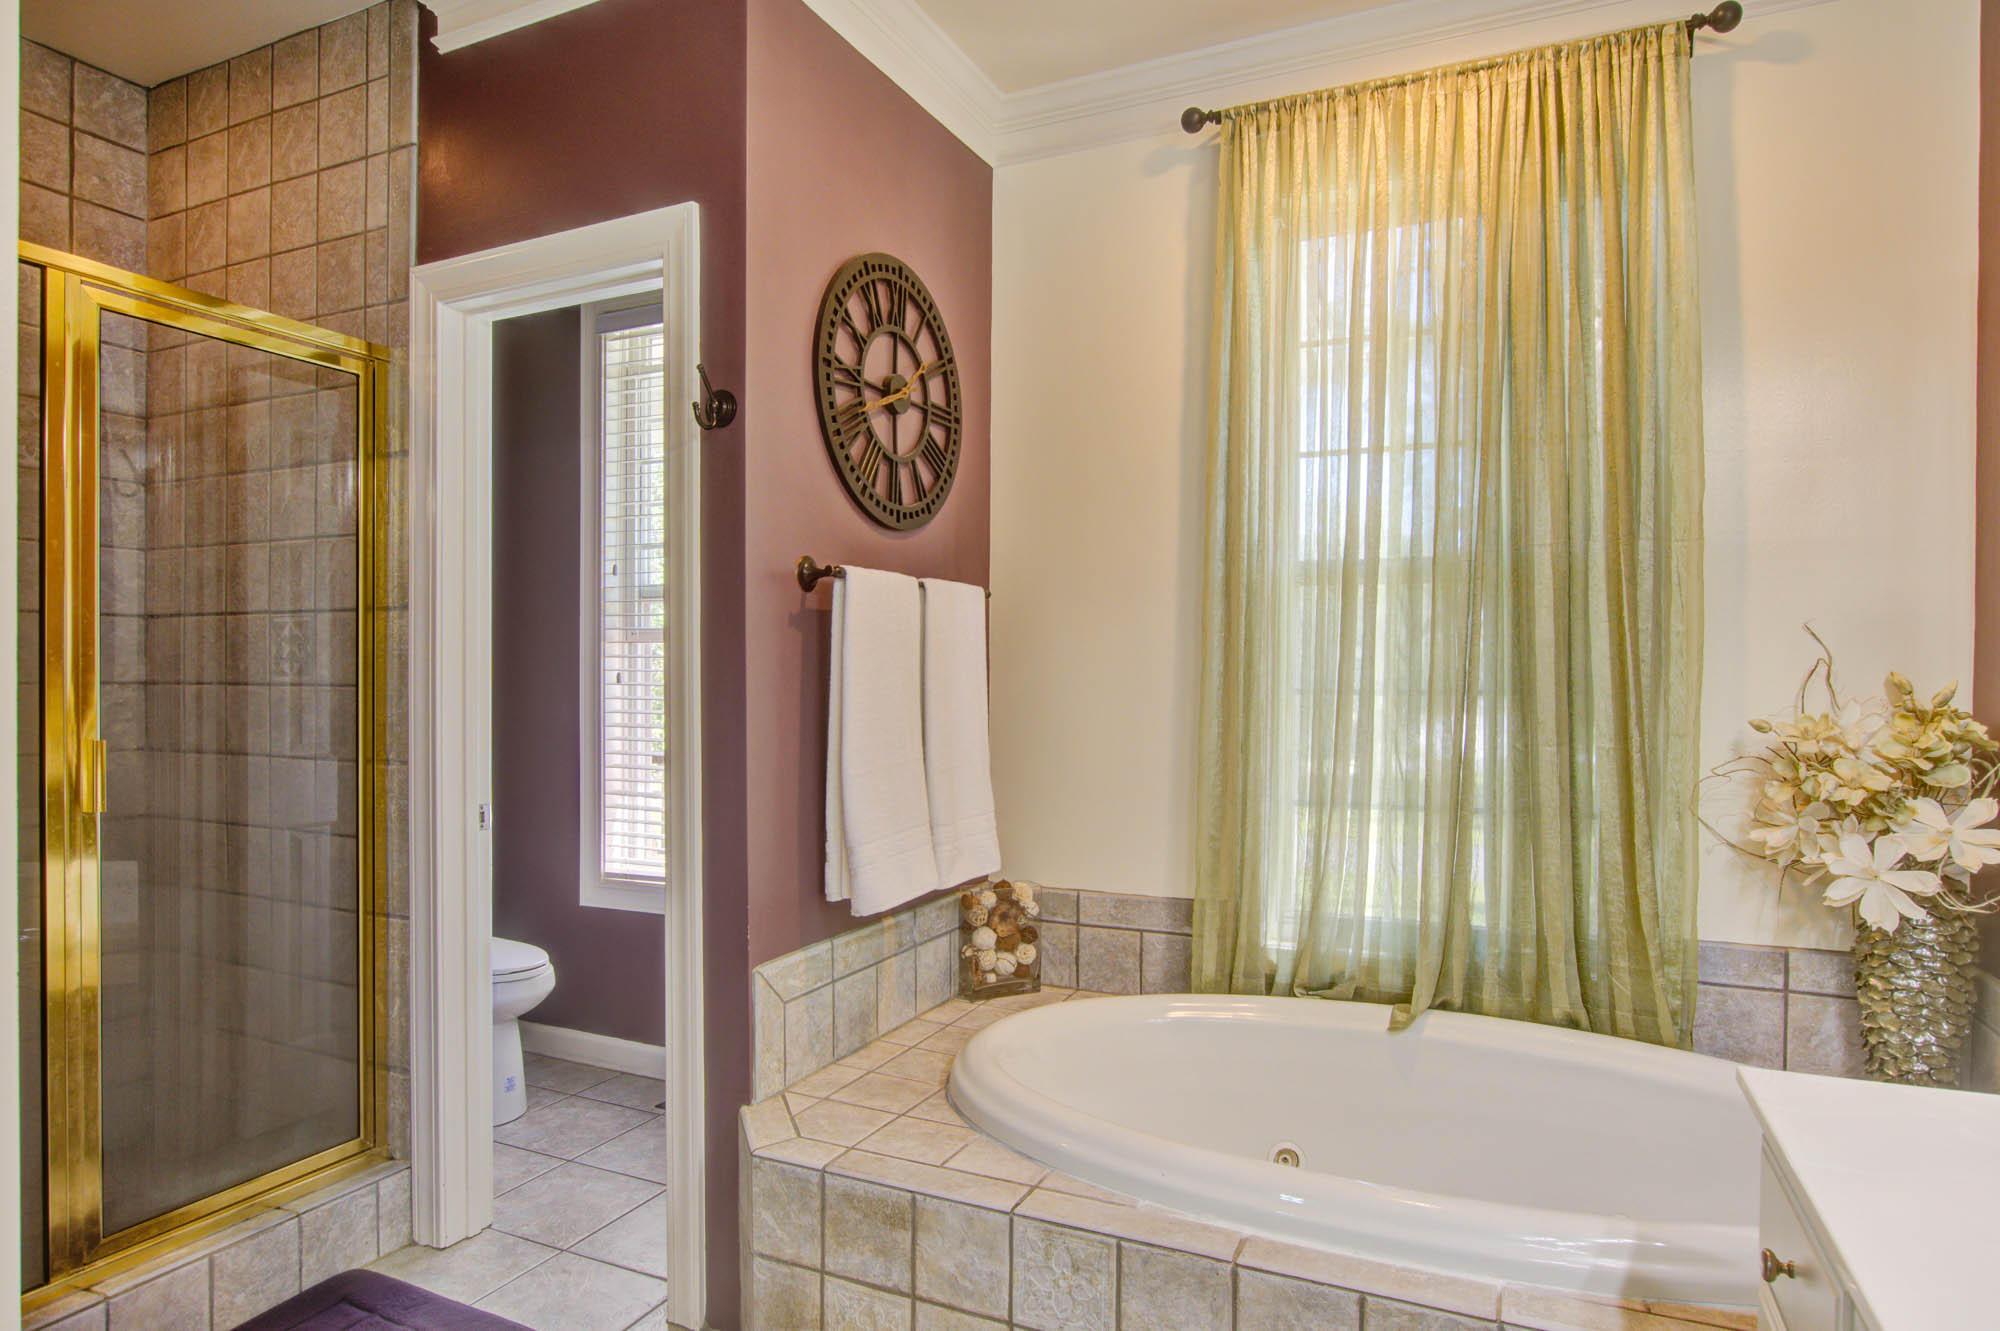 St Thomas Point Homes For Sale - 307 Jamesbury, Charleston, SC - 20